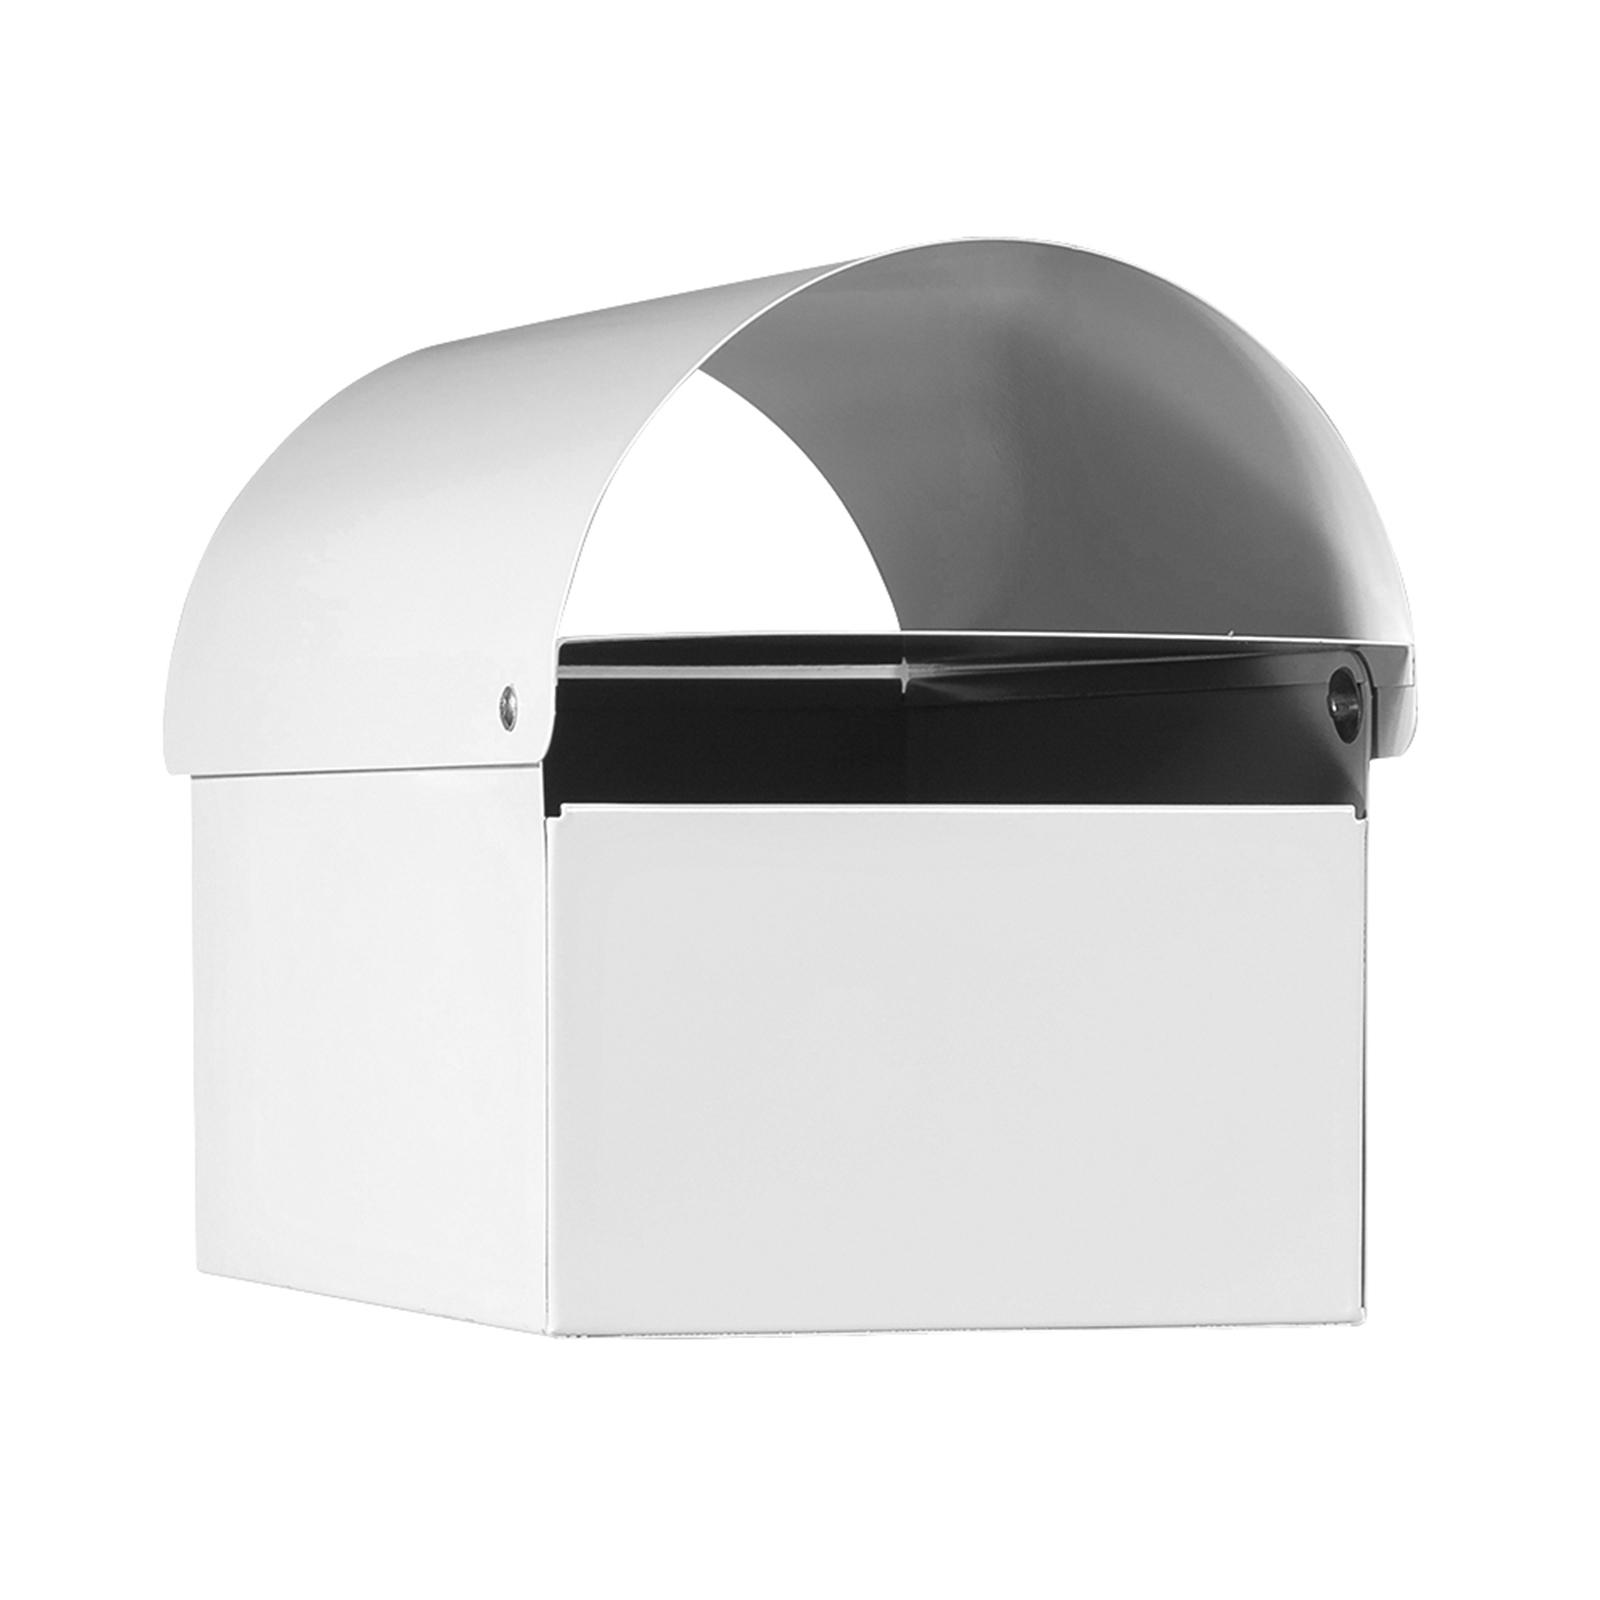 Sandleford White Economy Dune Post Mounted Letterbox